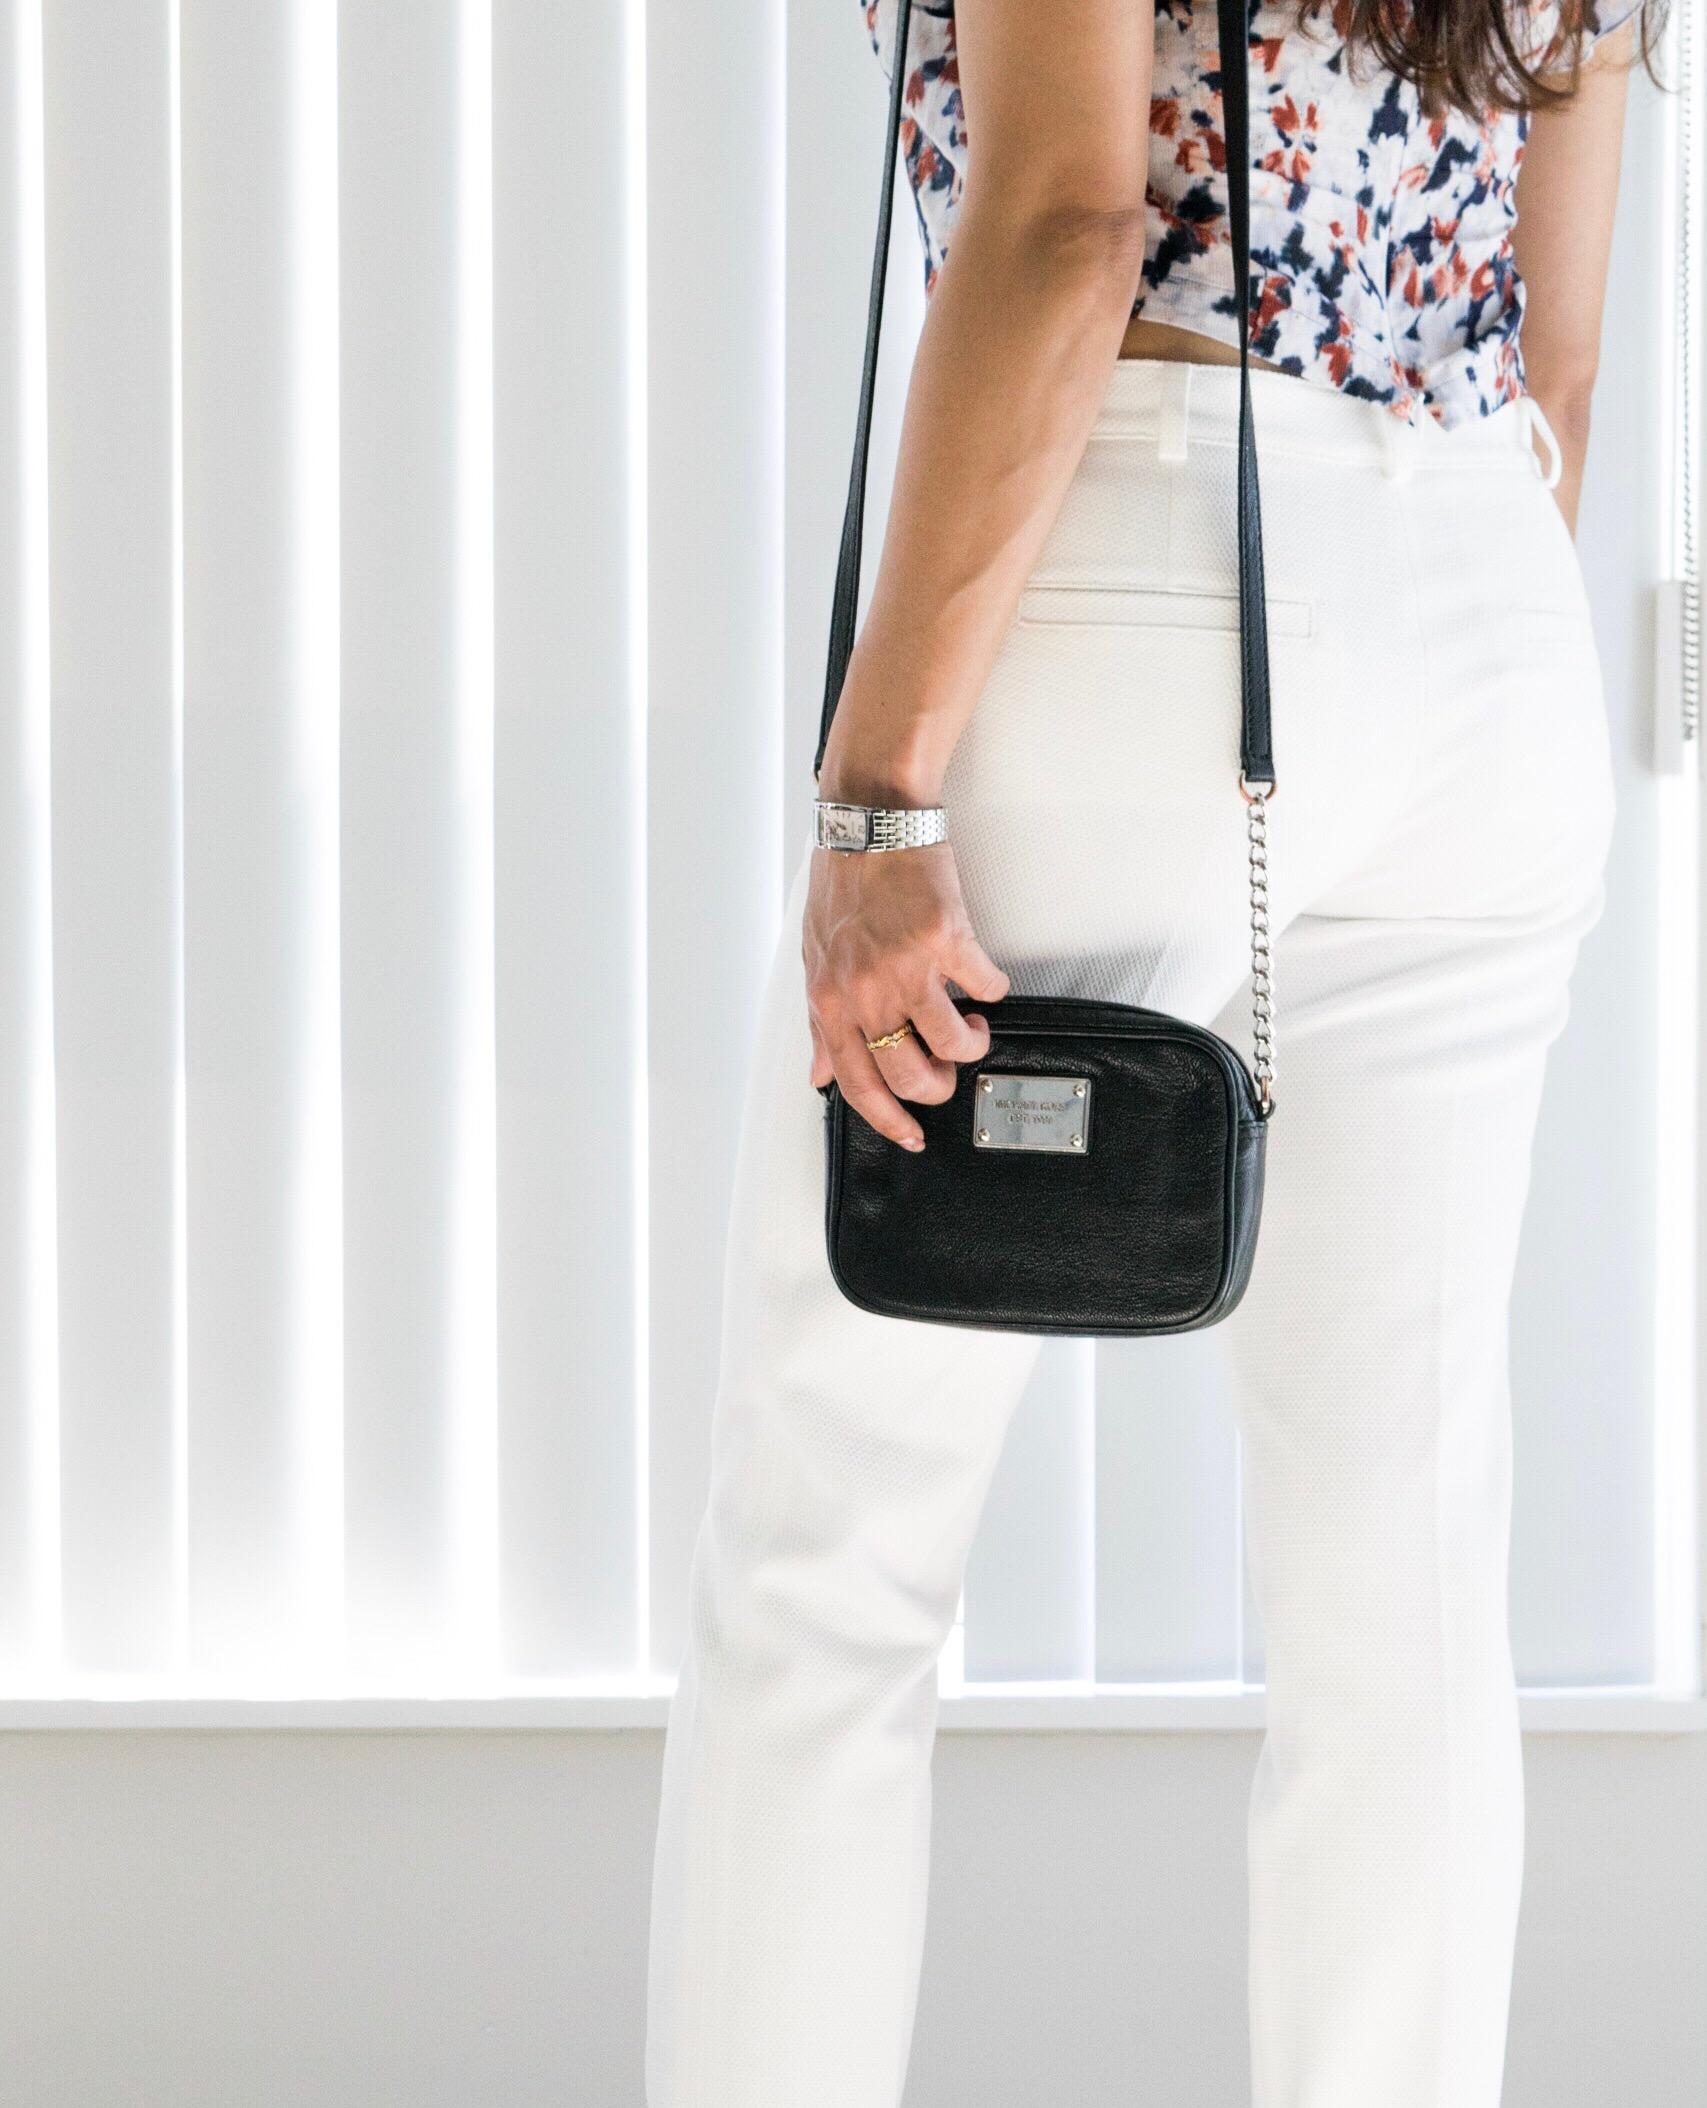 Crossbody Handbag and Wrist Watch - Nidhi Patel